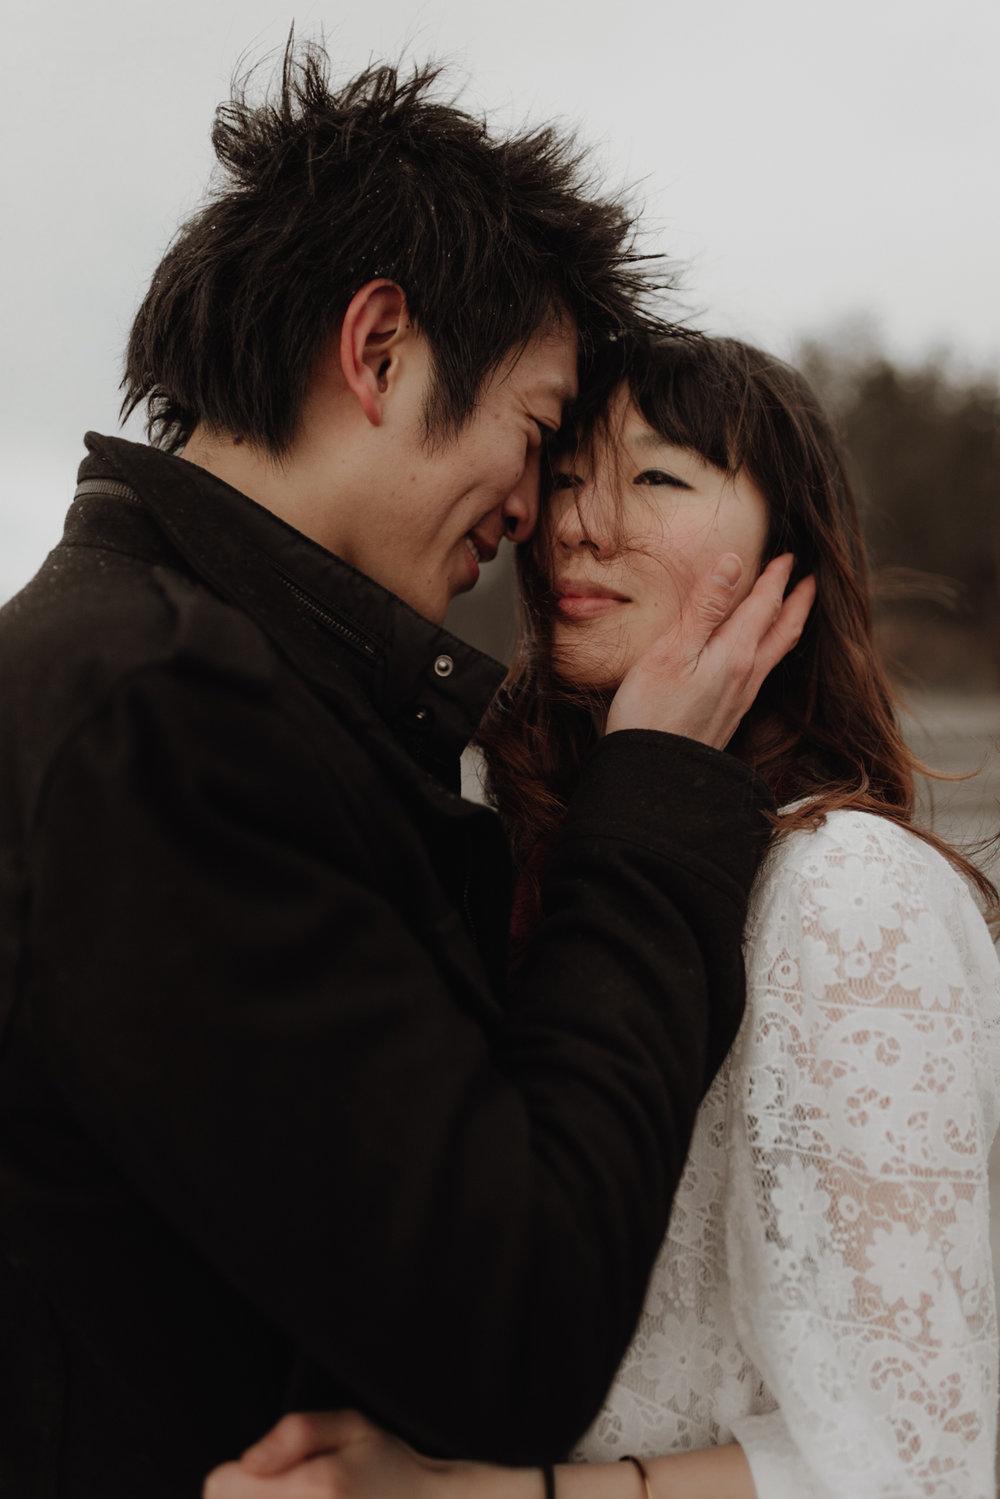 seattle-wedding-photographer-kerouac-0202.jpg